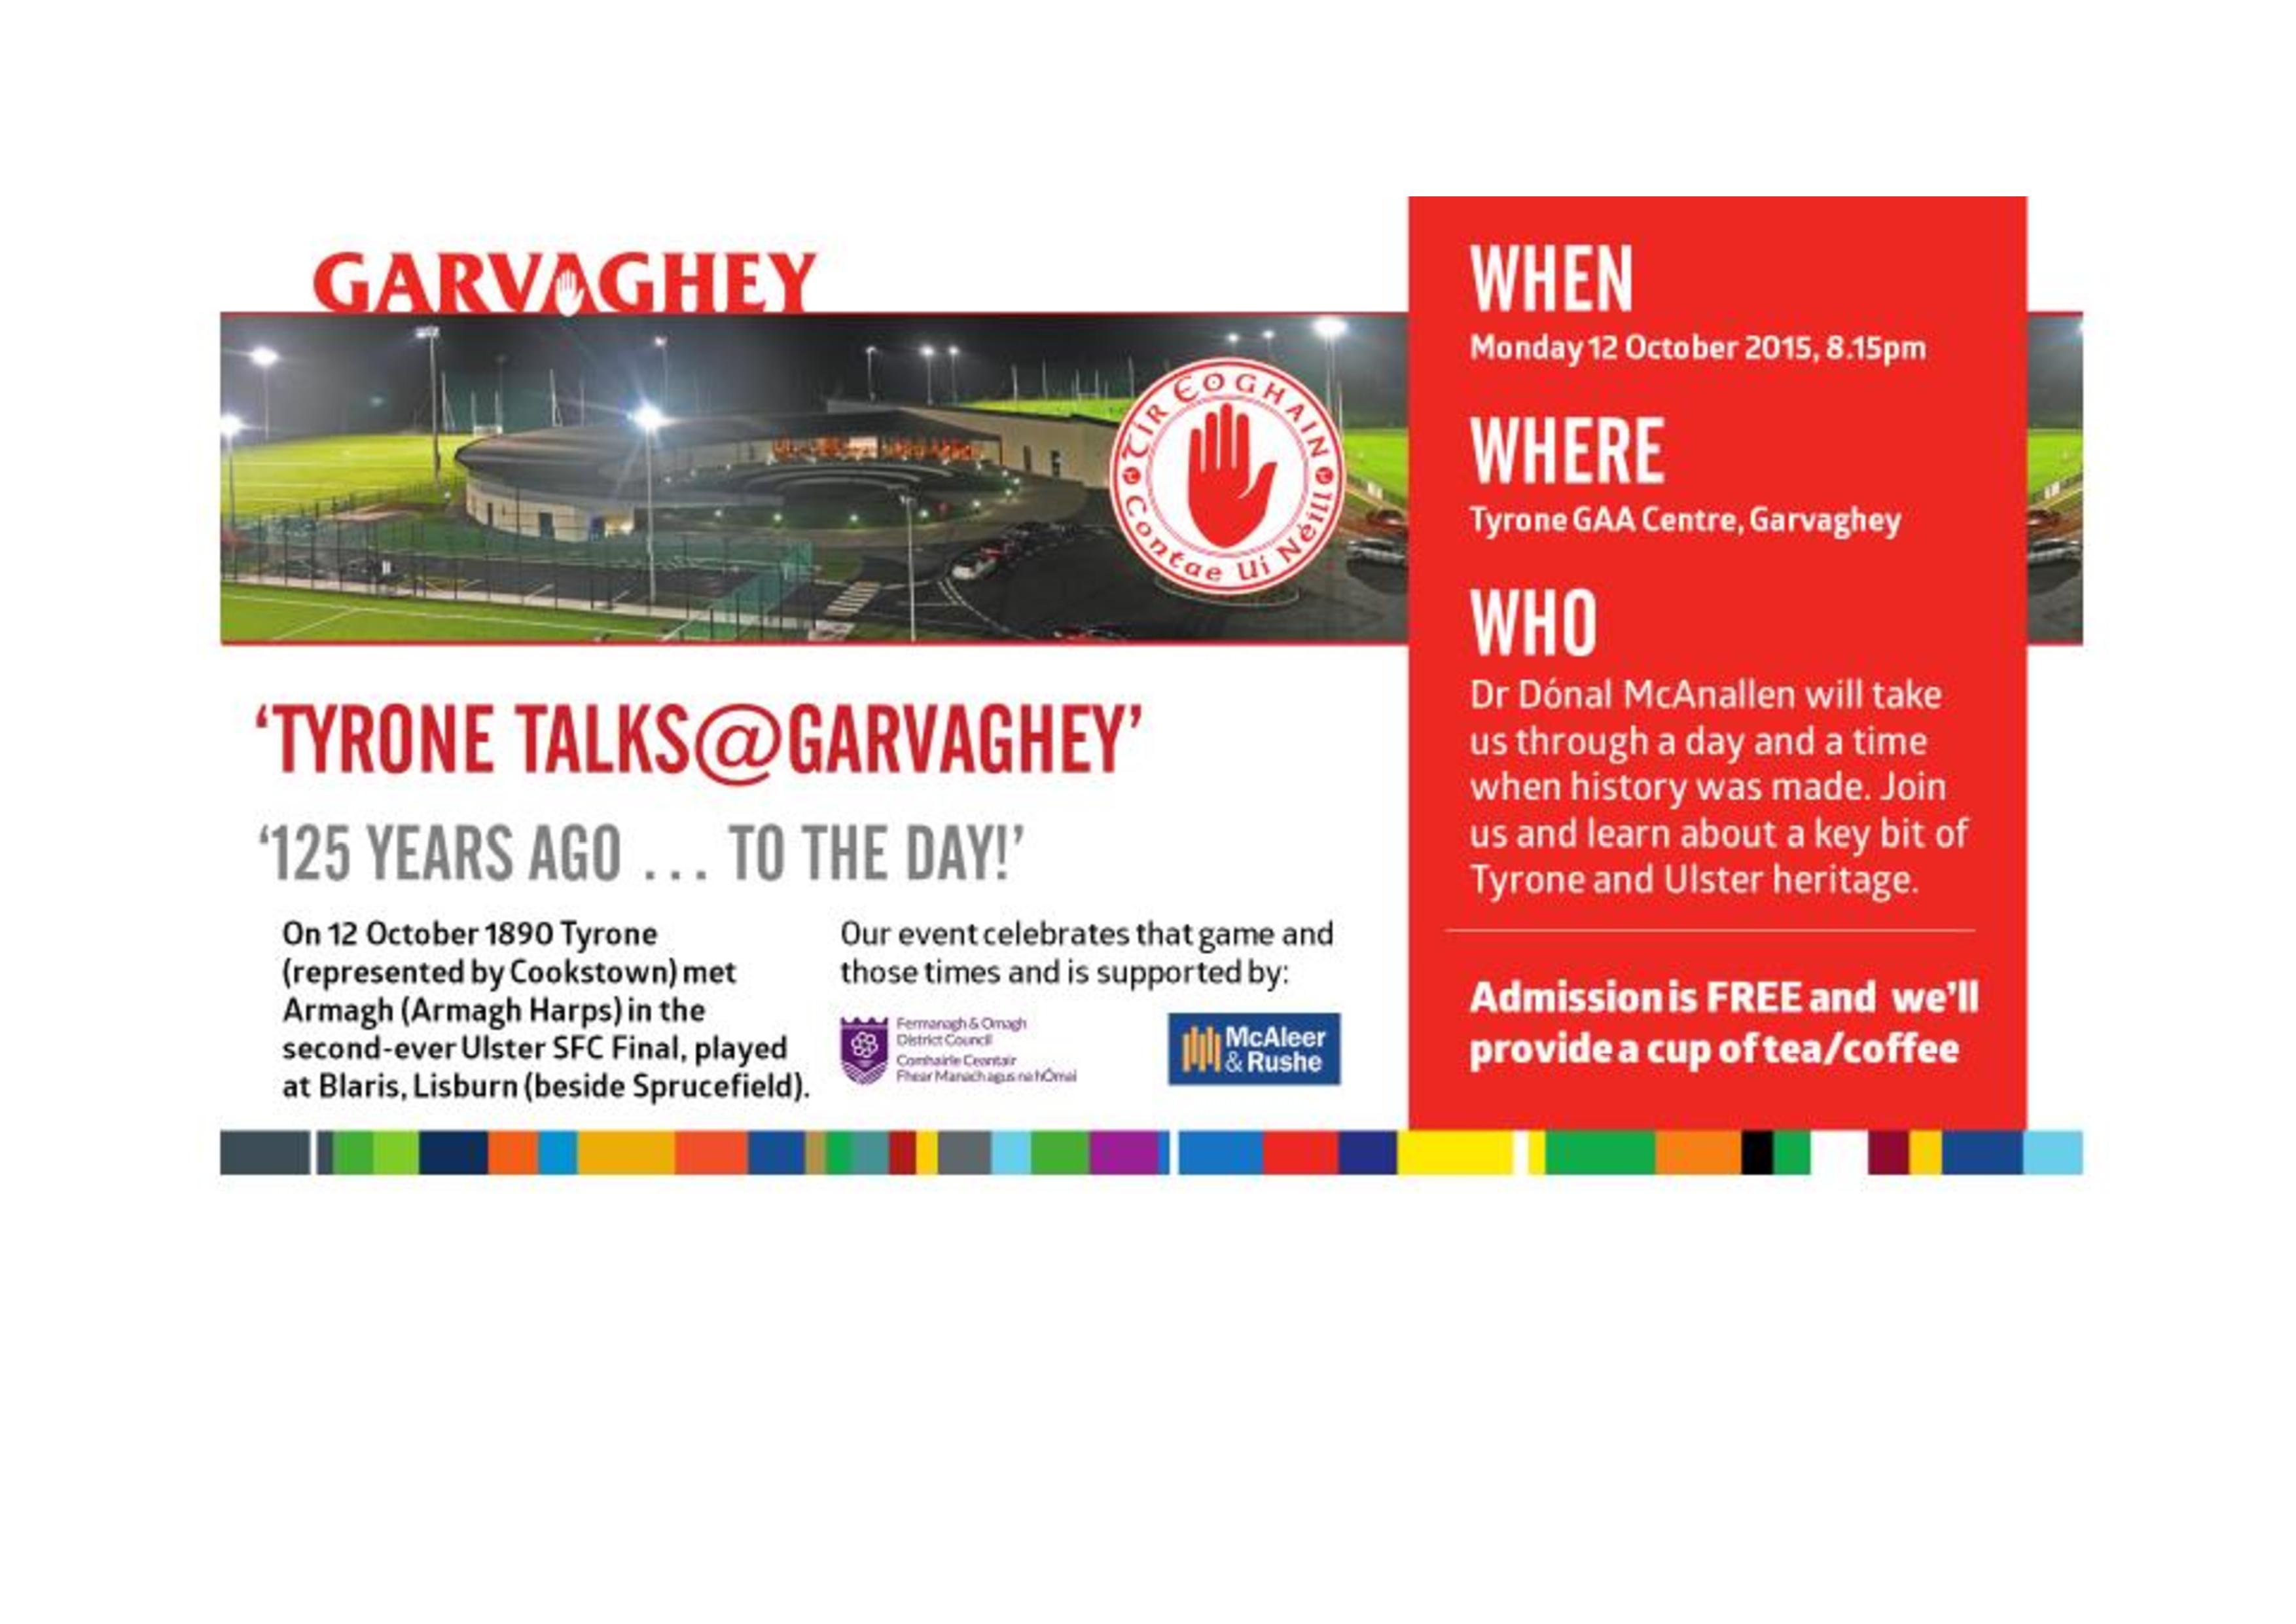 Tyrone Talks @ Garvaghey